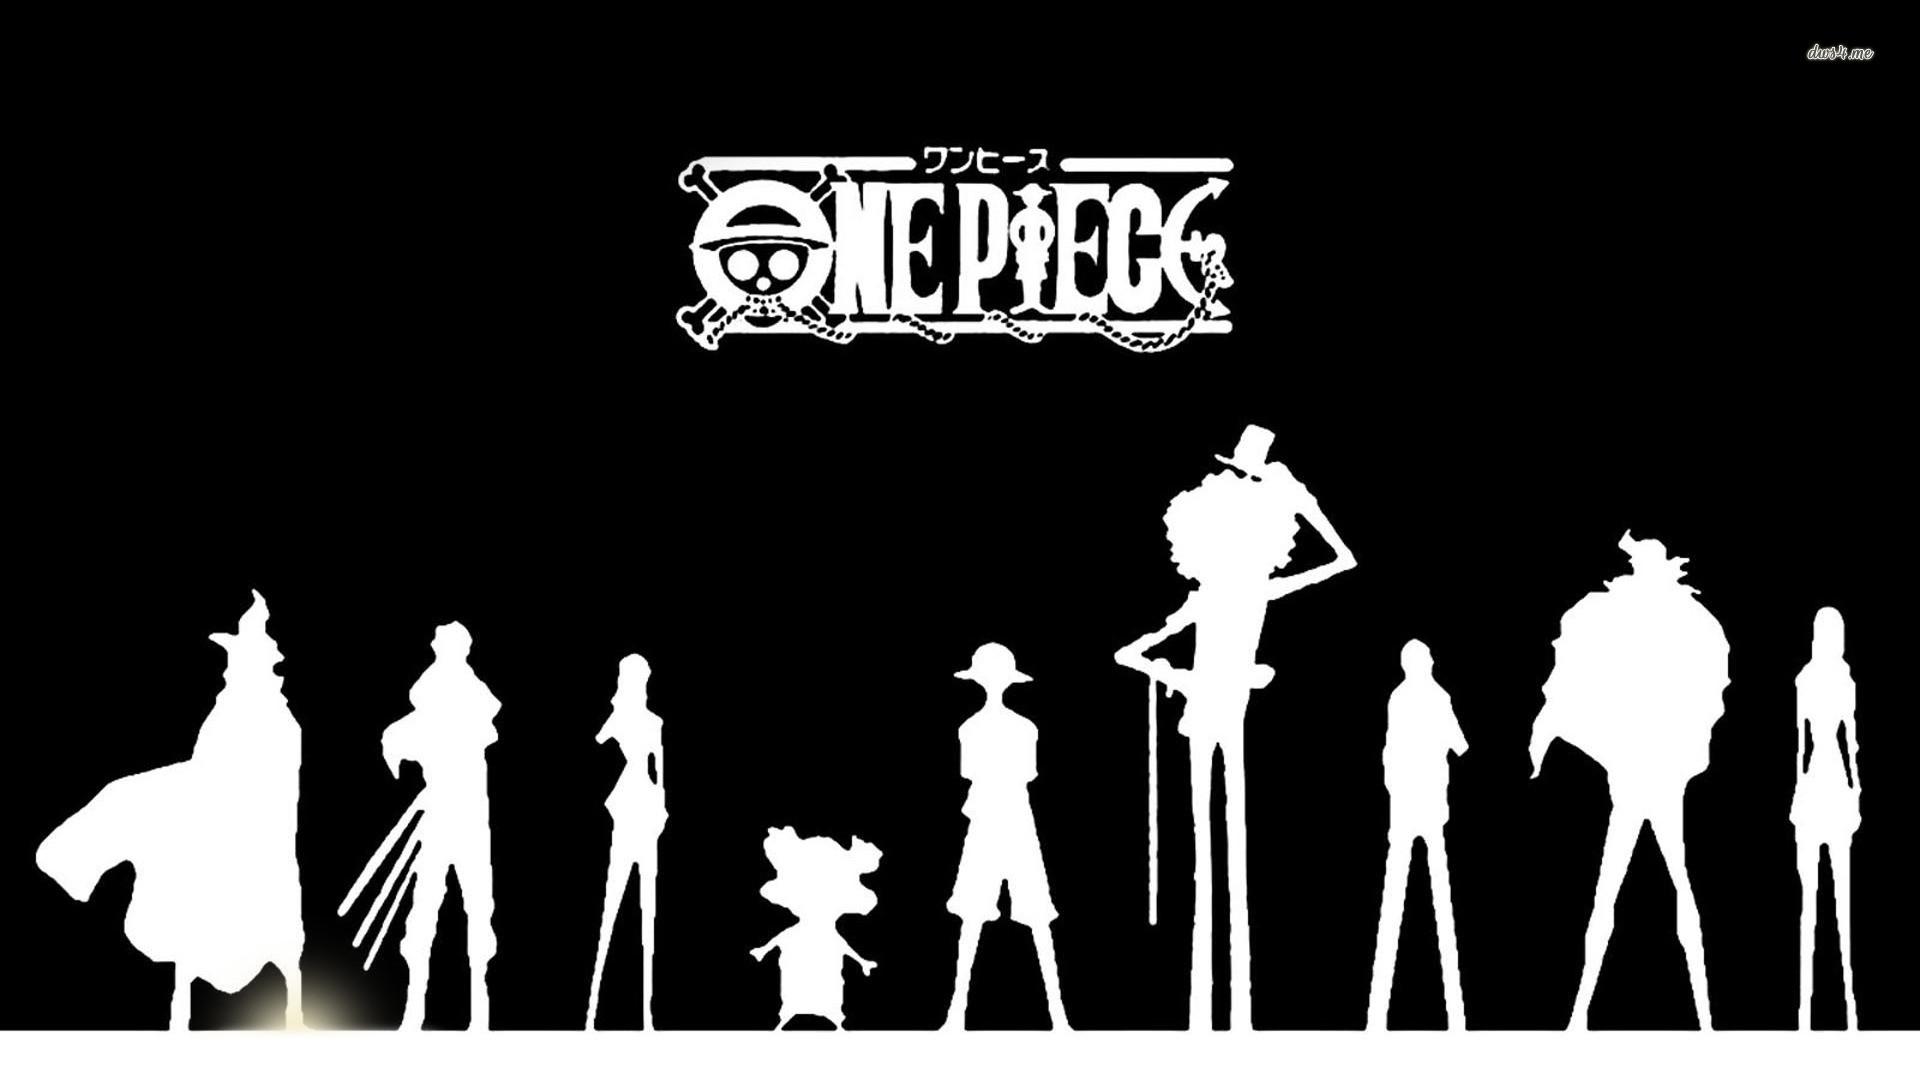 Trafalgar Law Iphone Wallpaper One Piece Logo Wallpaper 65 Images